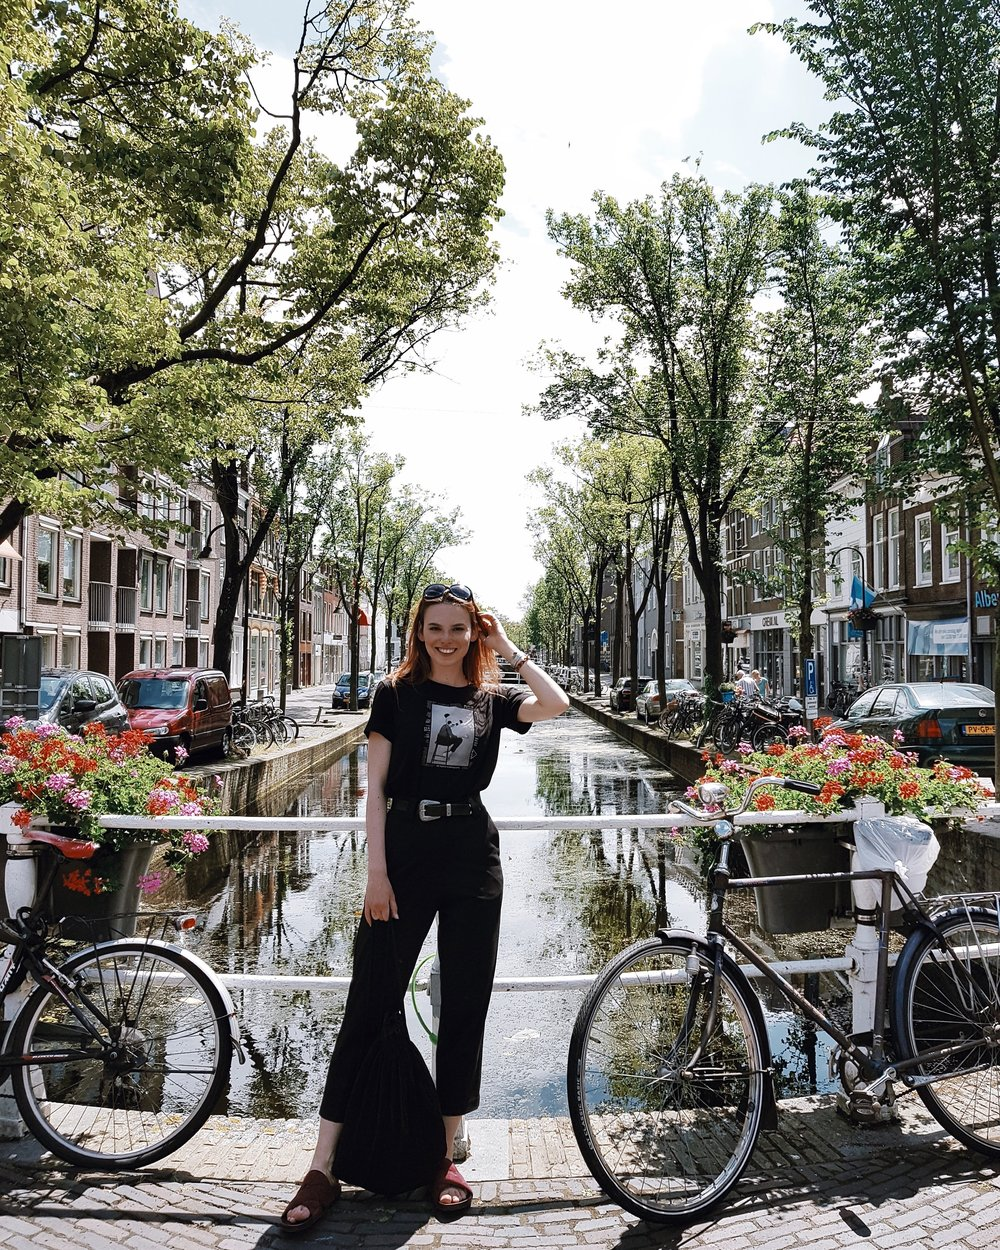 near Rotterdam